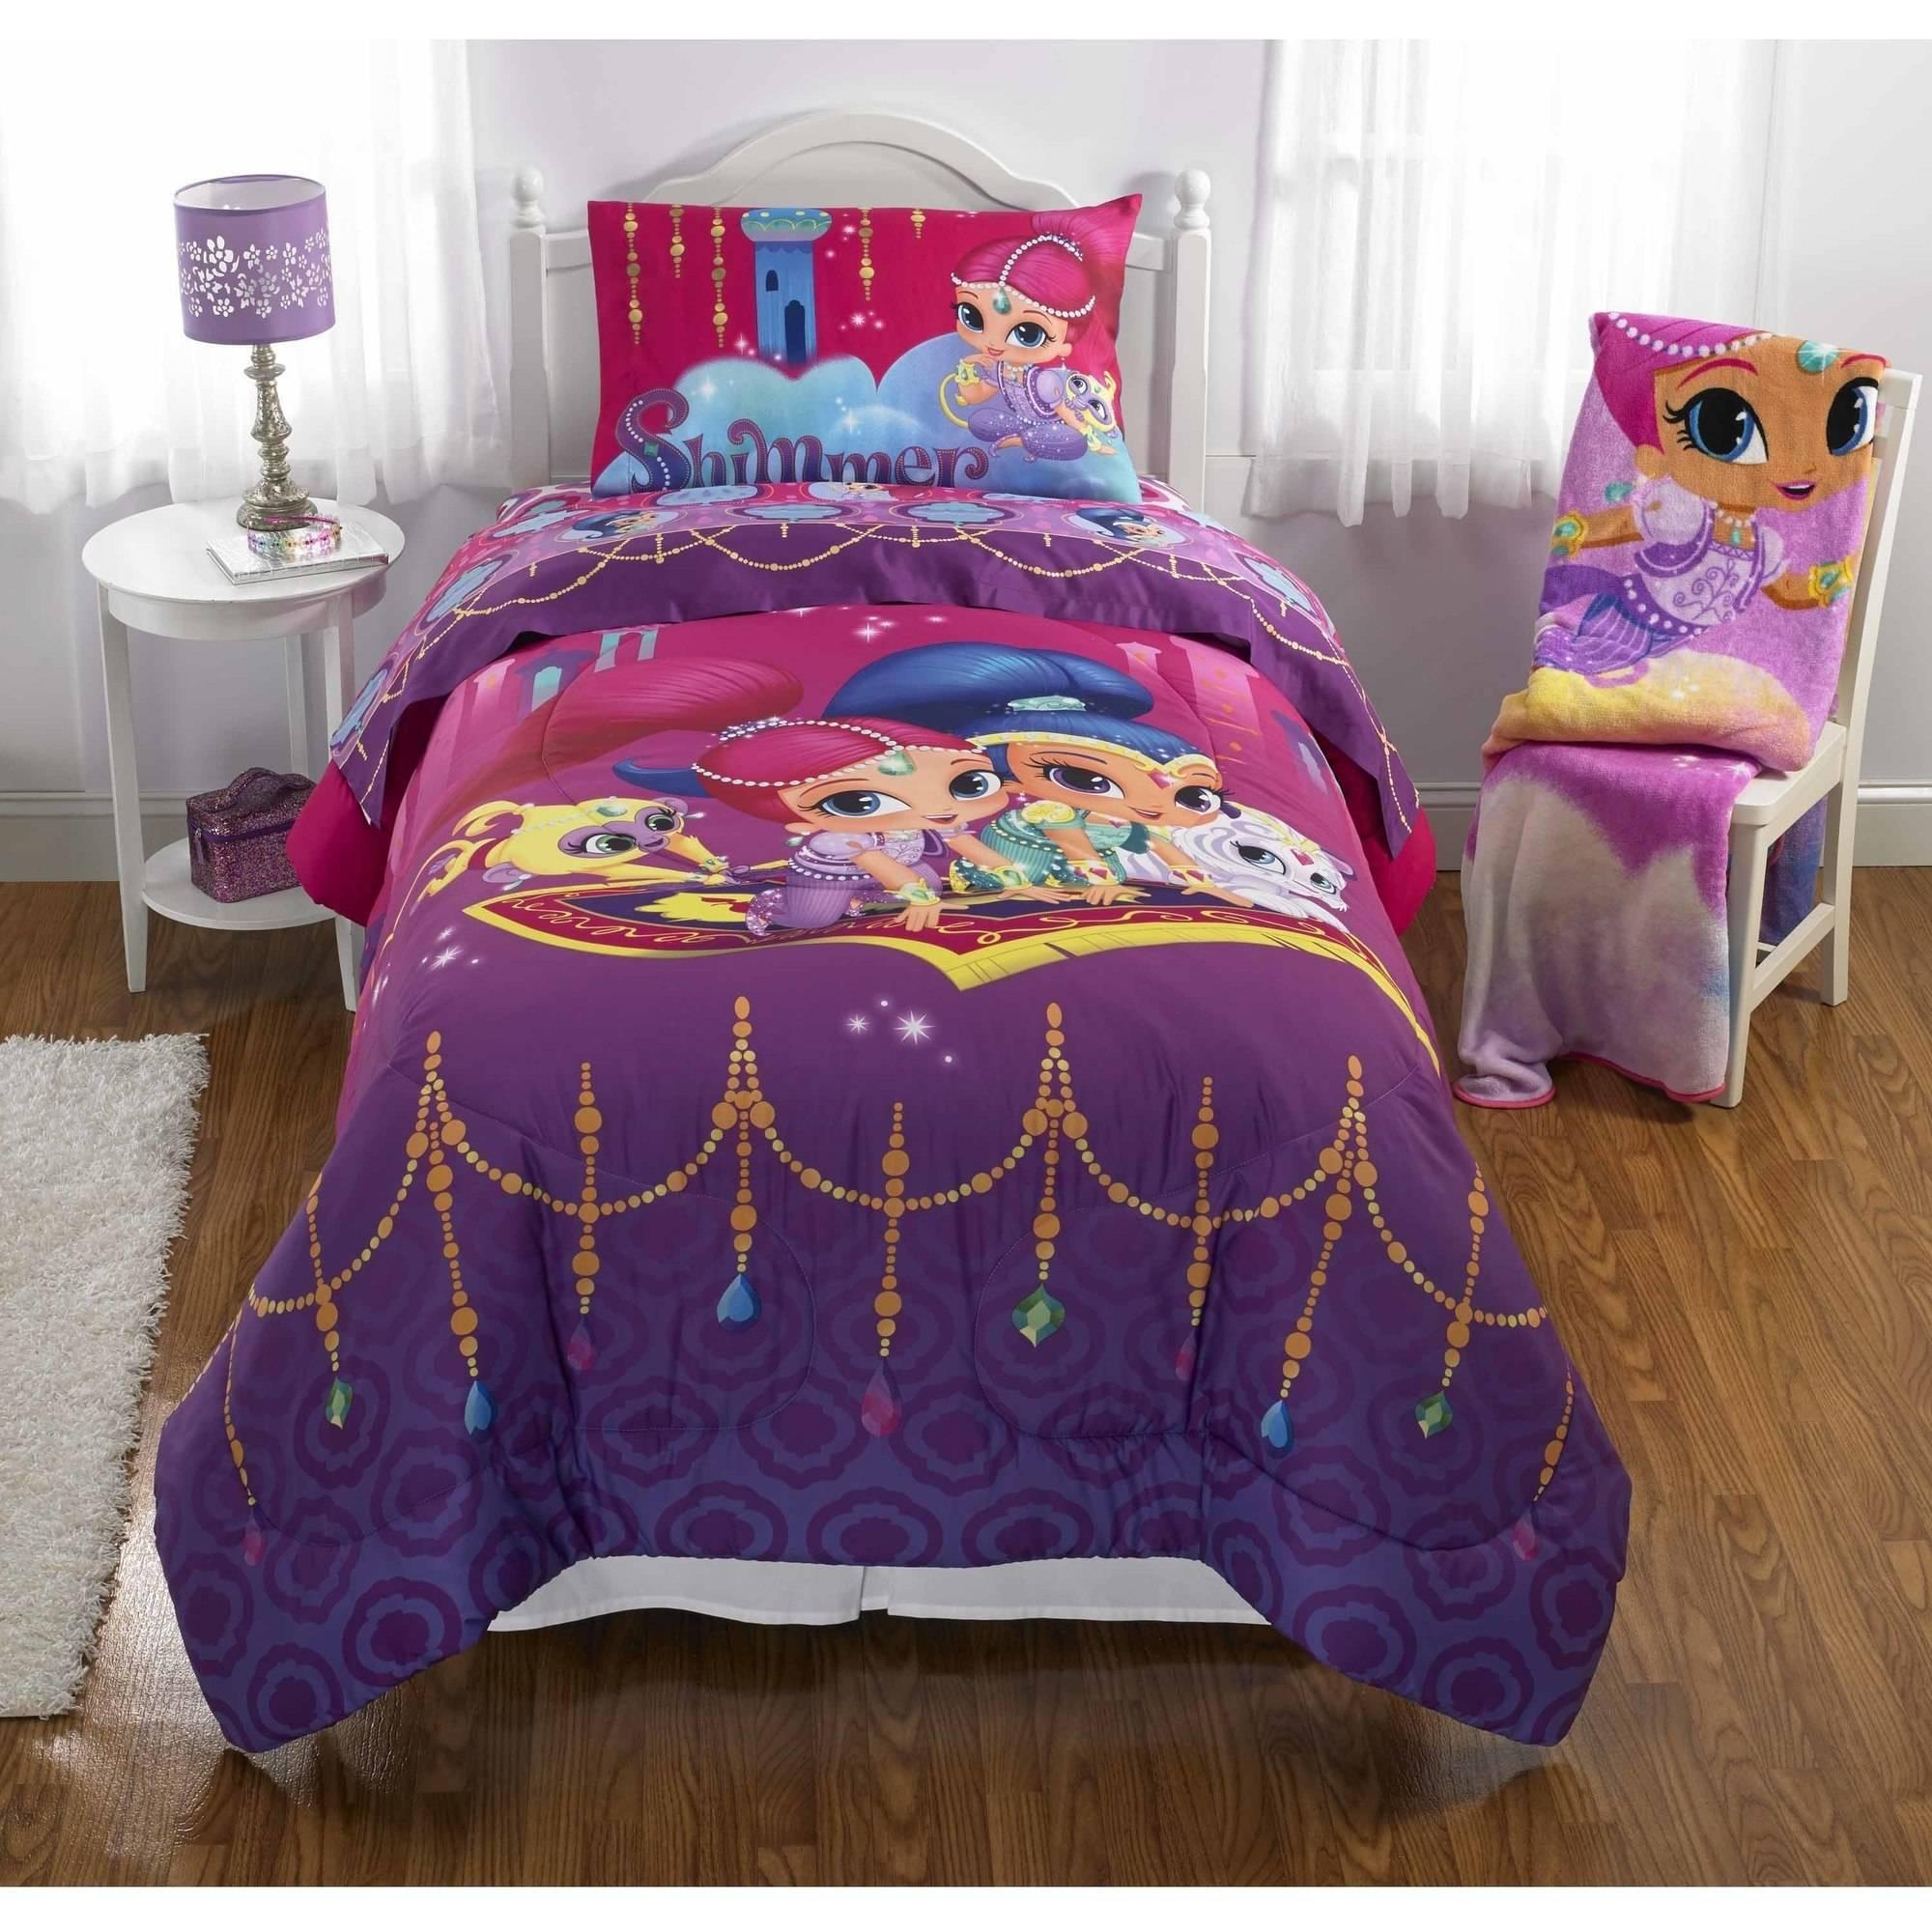 Shimmer and Shine Magic Wonders Bed in Bag Bedding Set